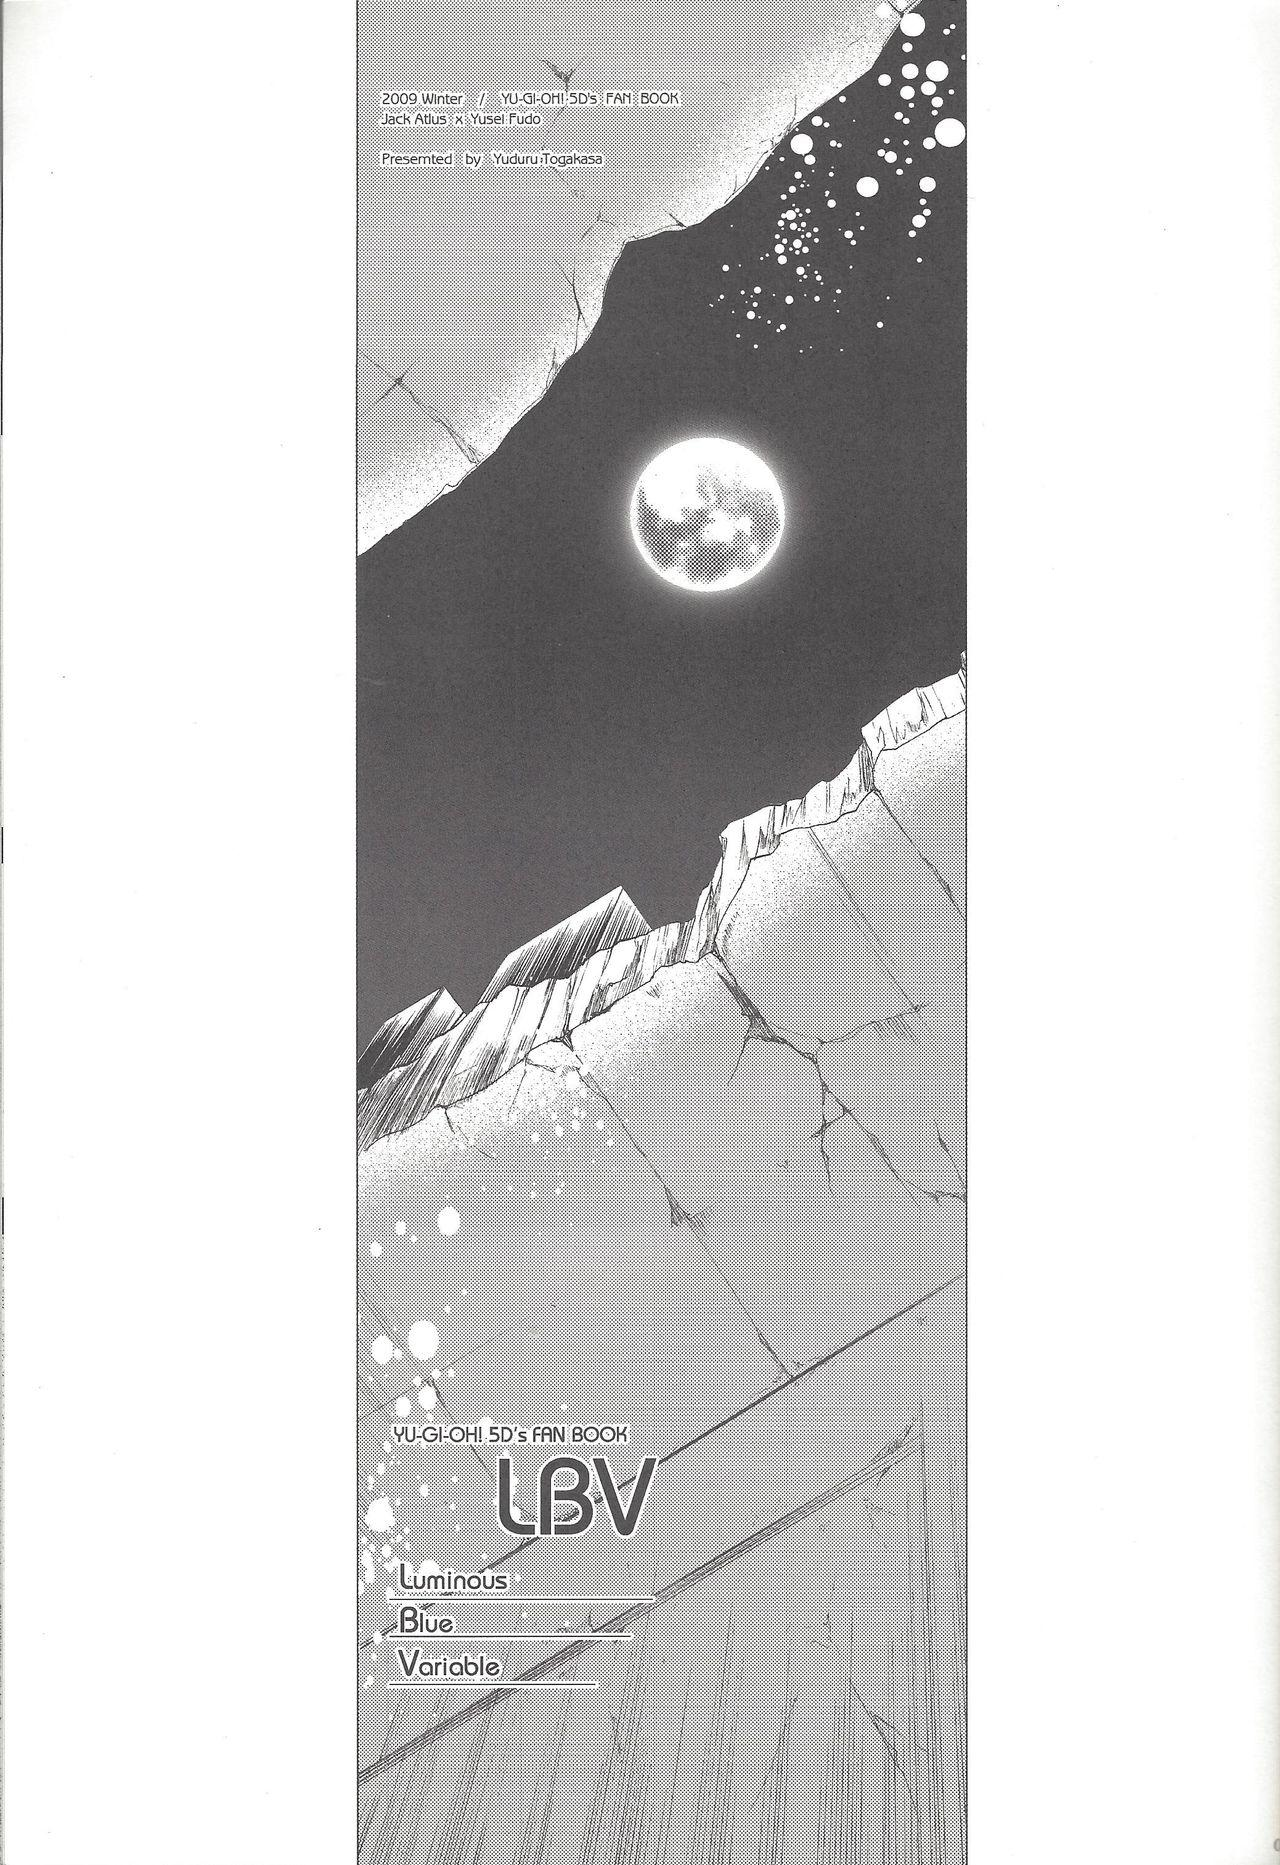 LBV - Luminous Blue Variable 1